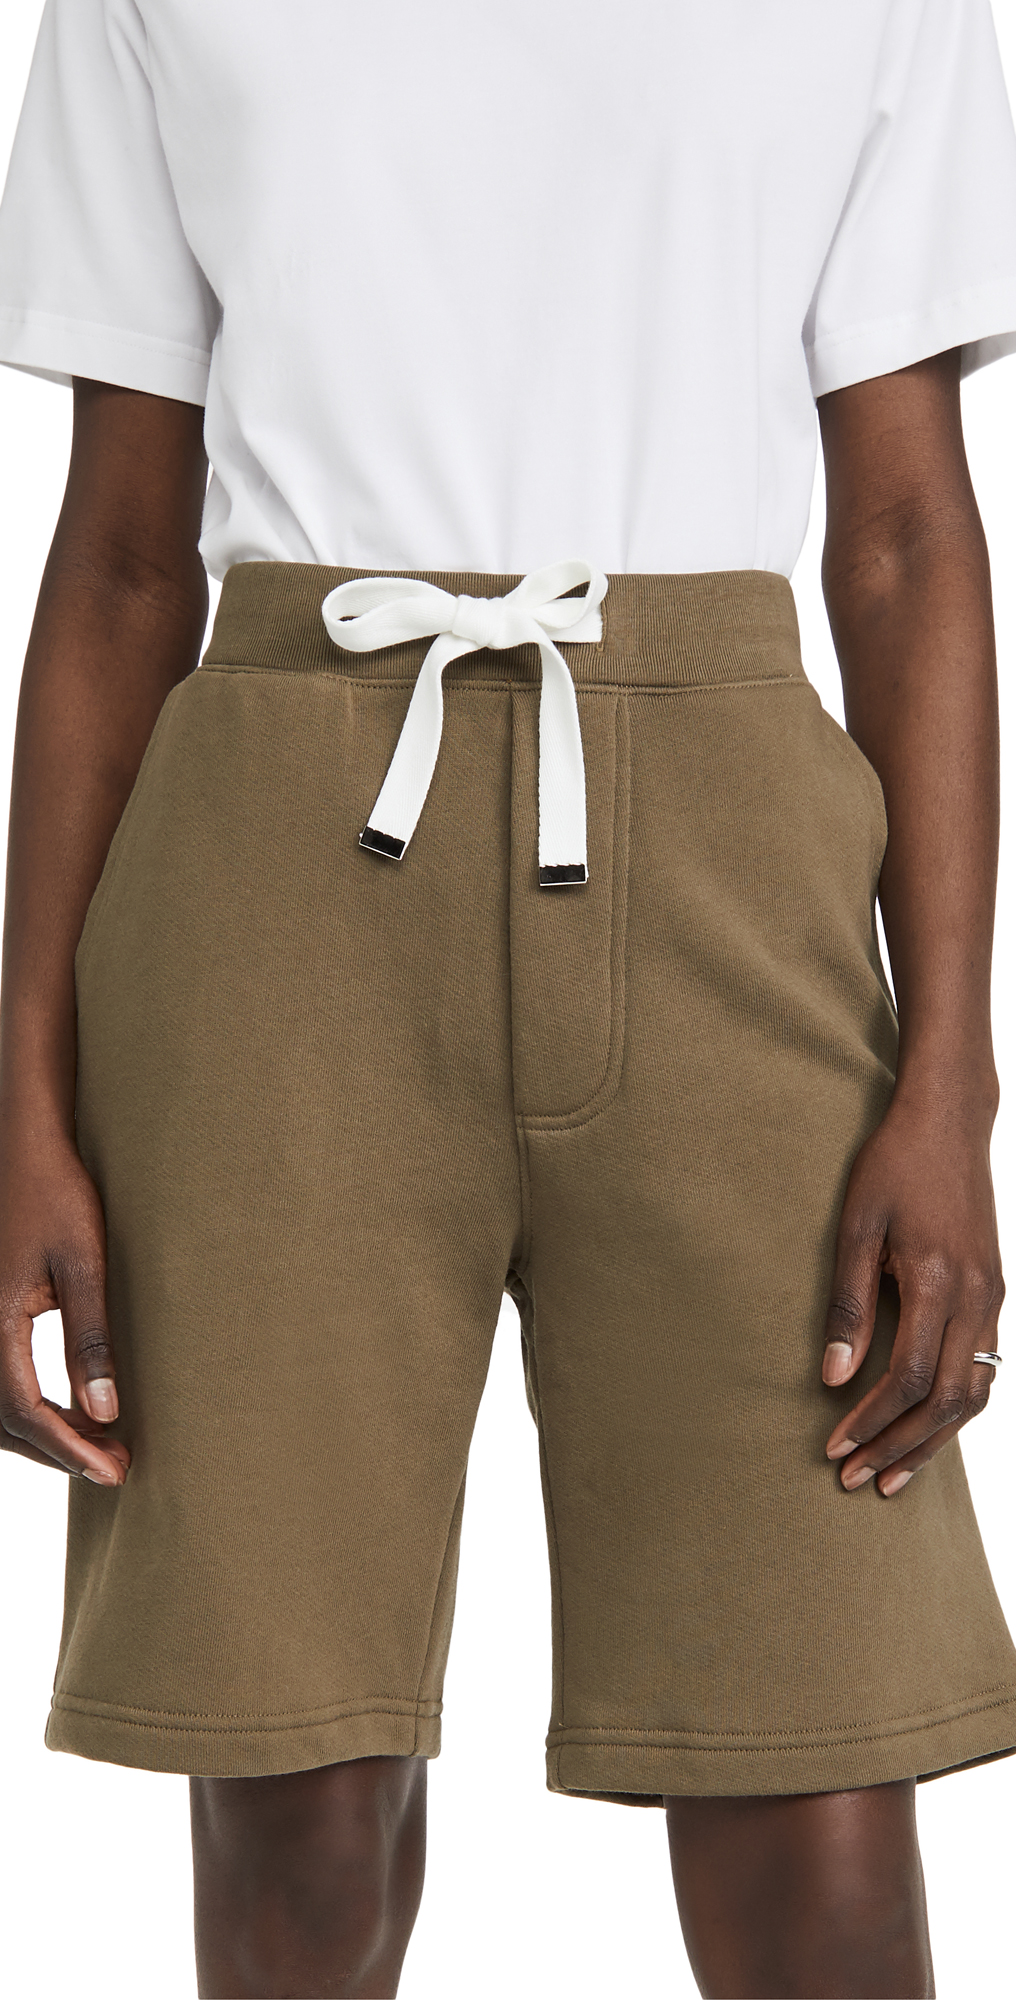 Tibi Cottons SWEATSHIRT SHORTS